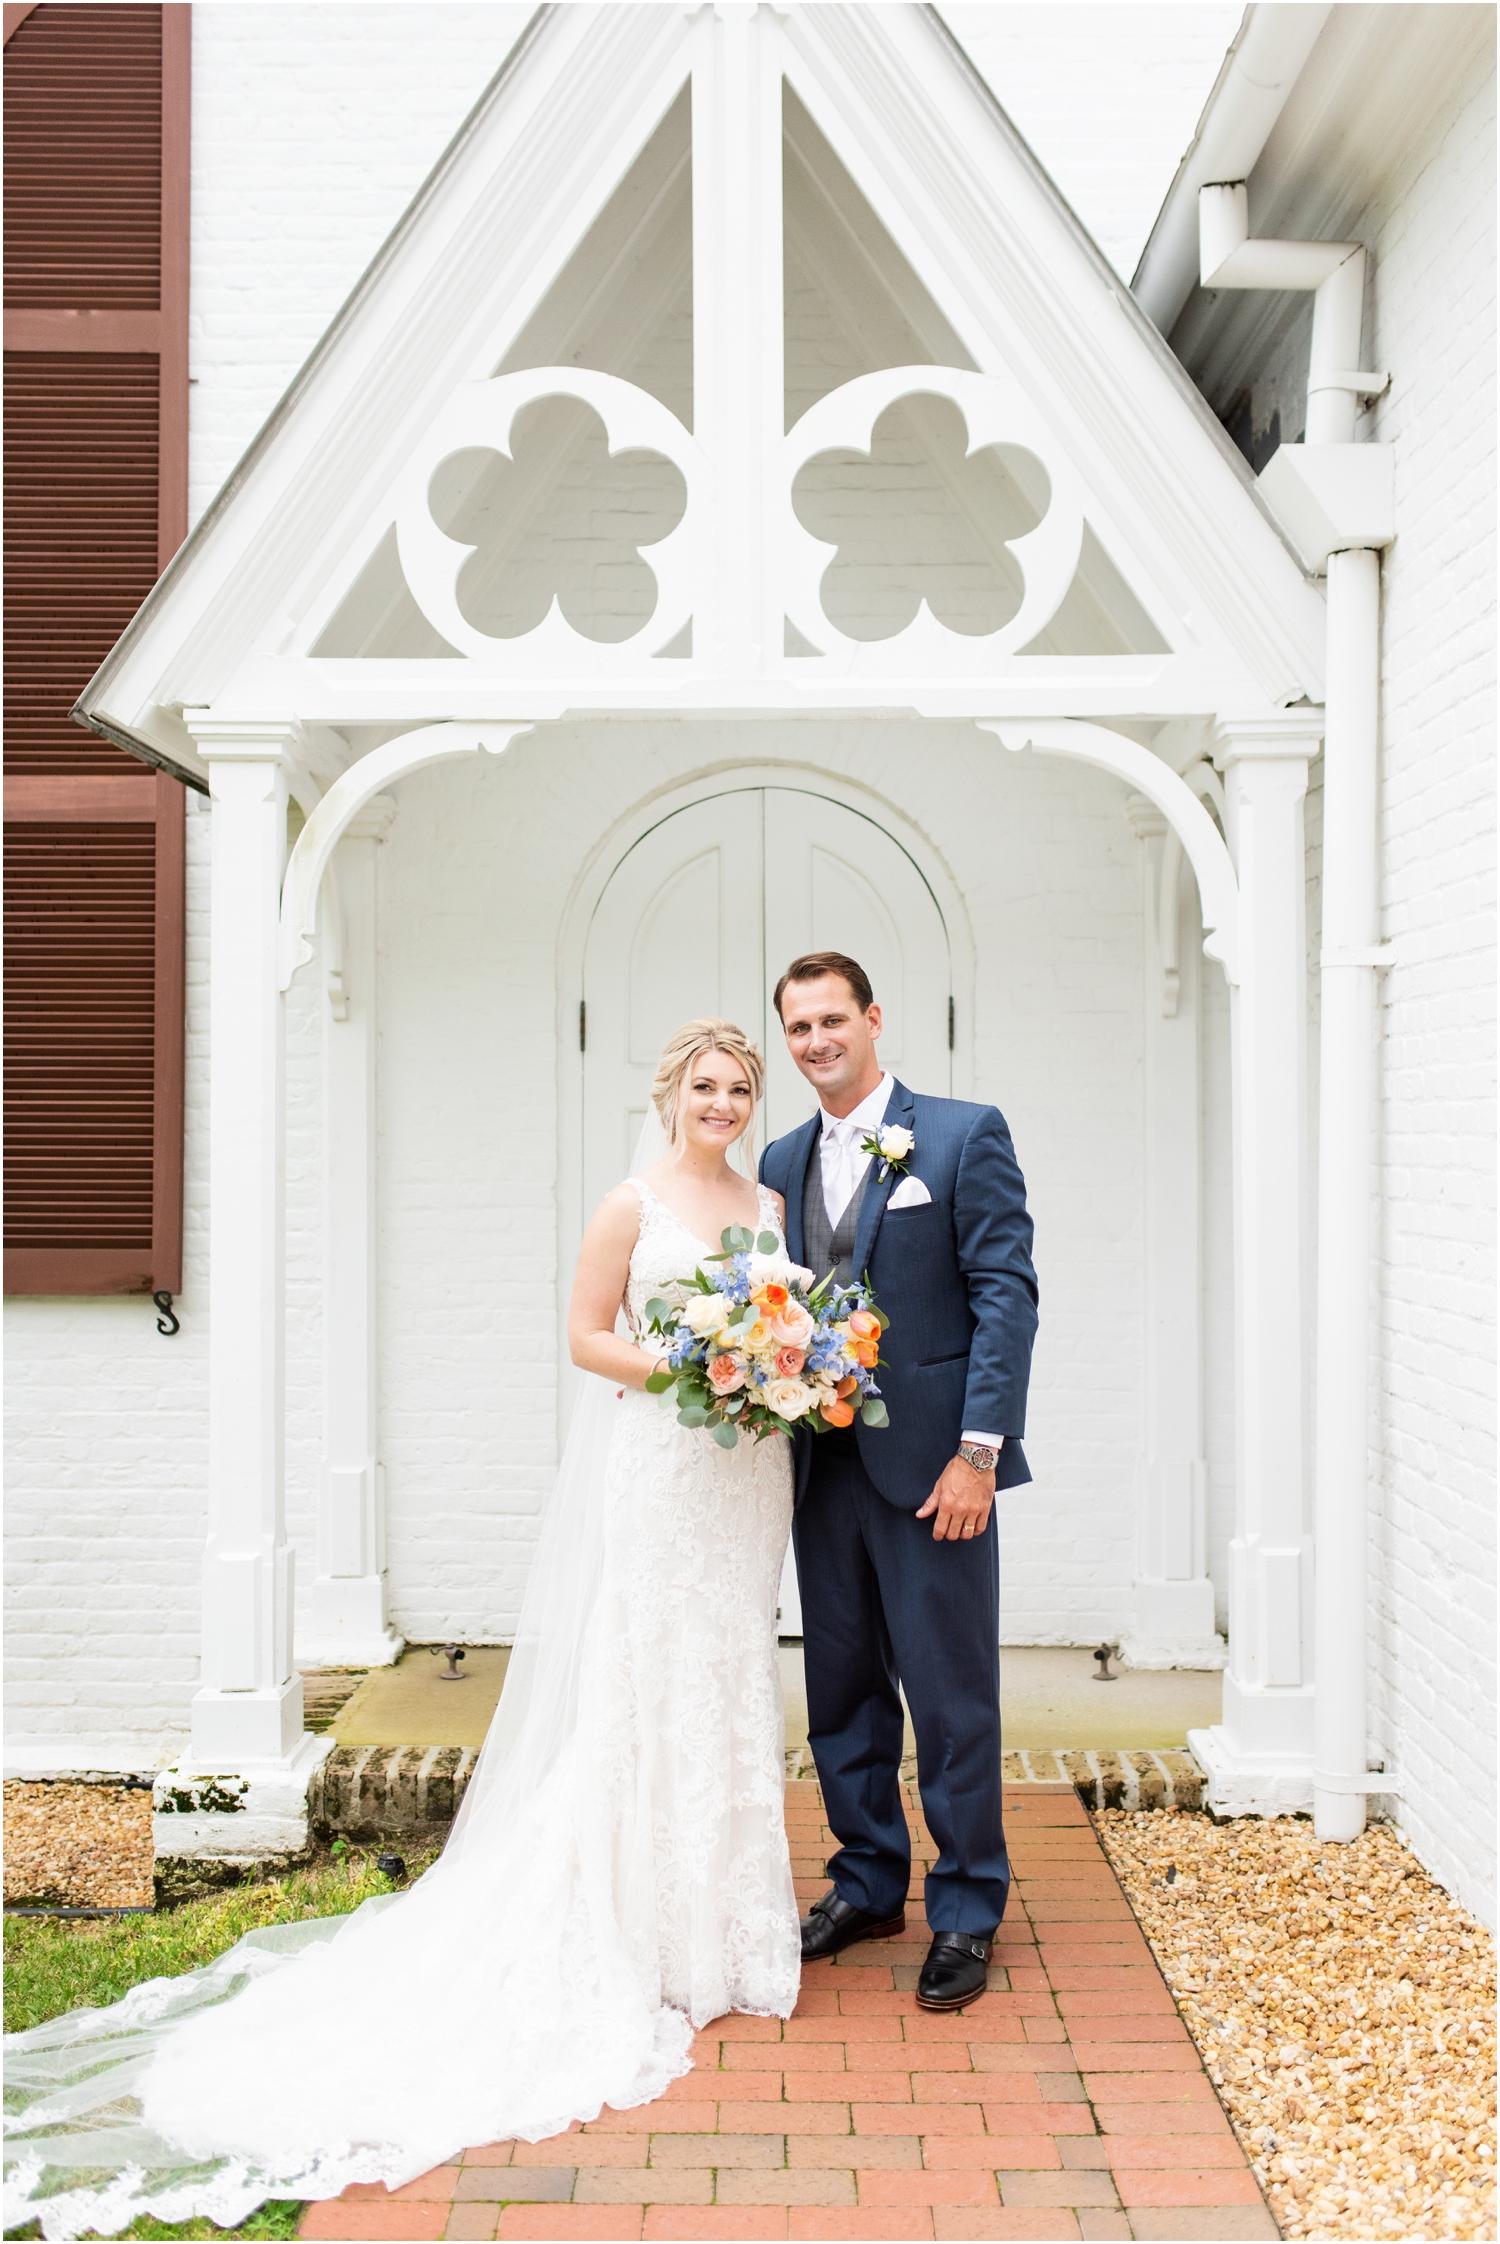 Old Christ Church Palafox Wharf Rainy Day Wedding Bride Groom Portraits Historical